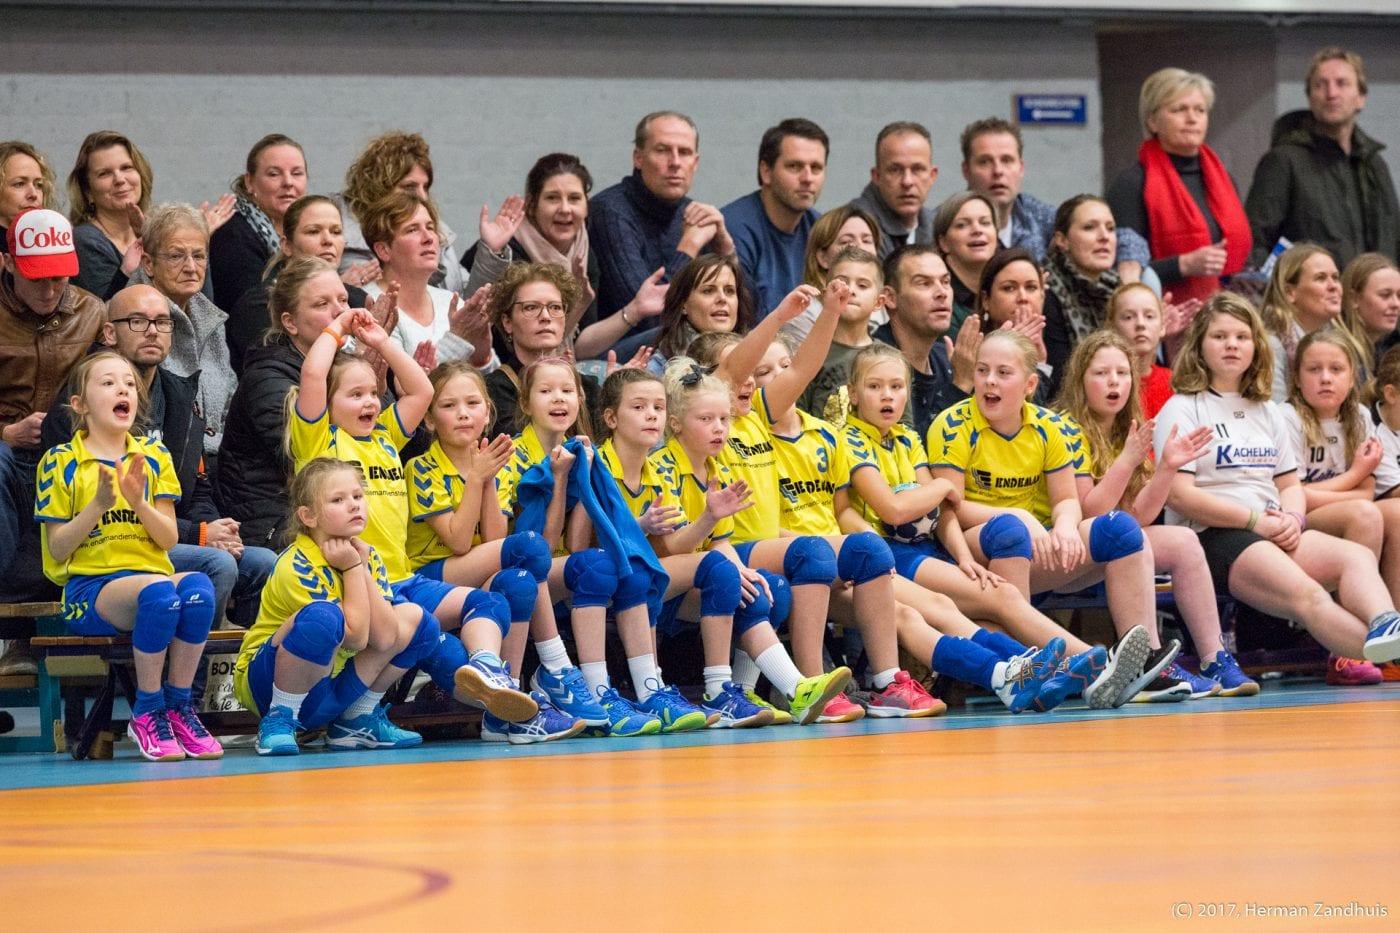 cropped HZ20171210 Borhave Maedilon 146129 - Eerste kampioenen op komst ??